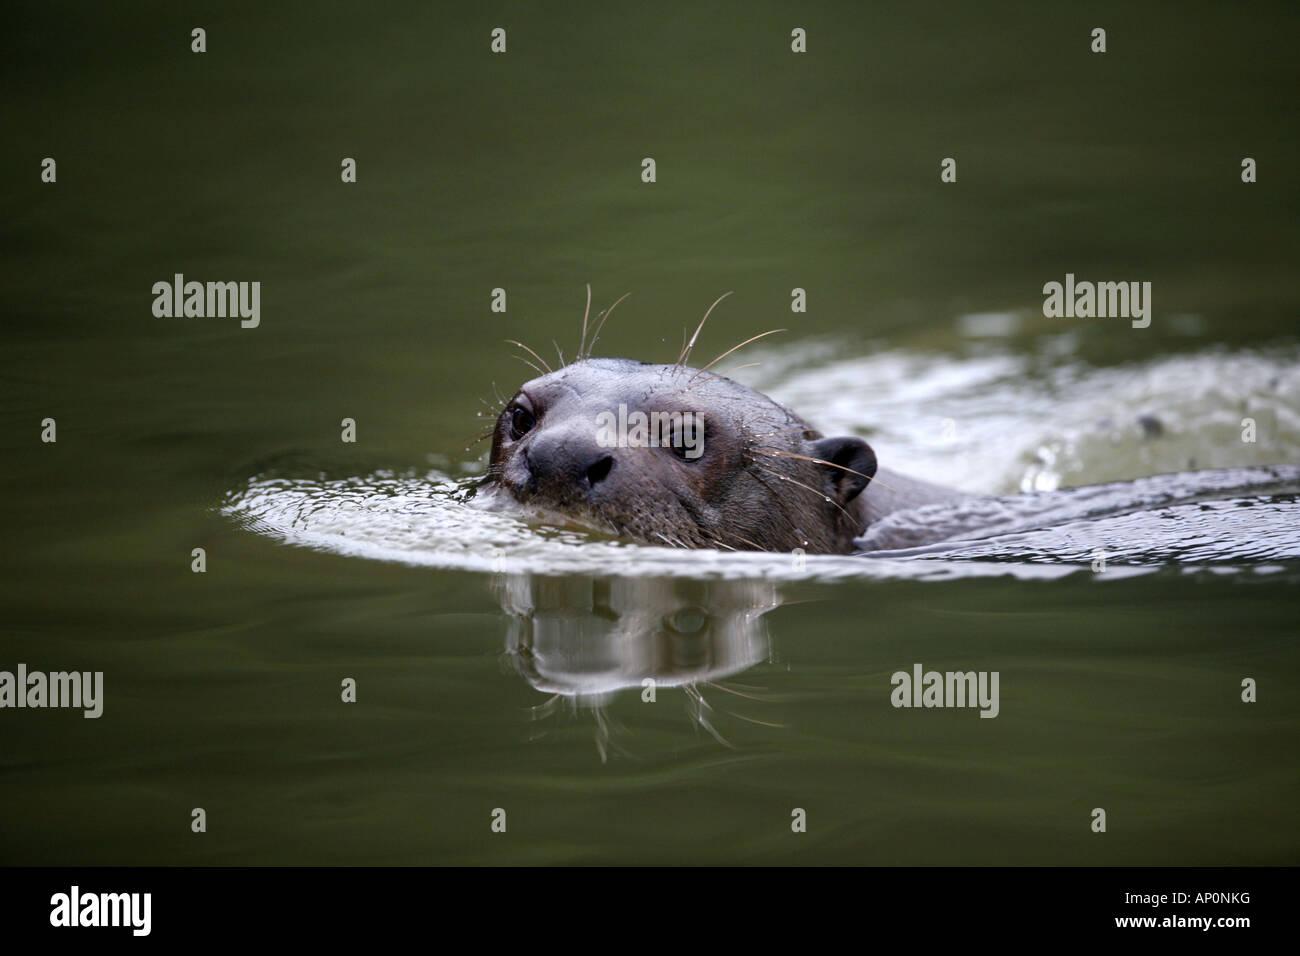 Giant Otter swimming - Stock Image